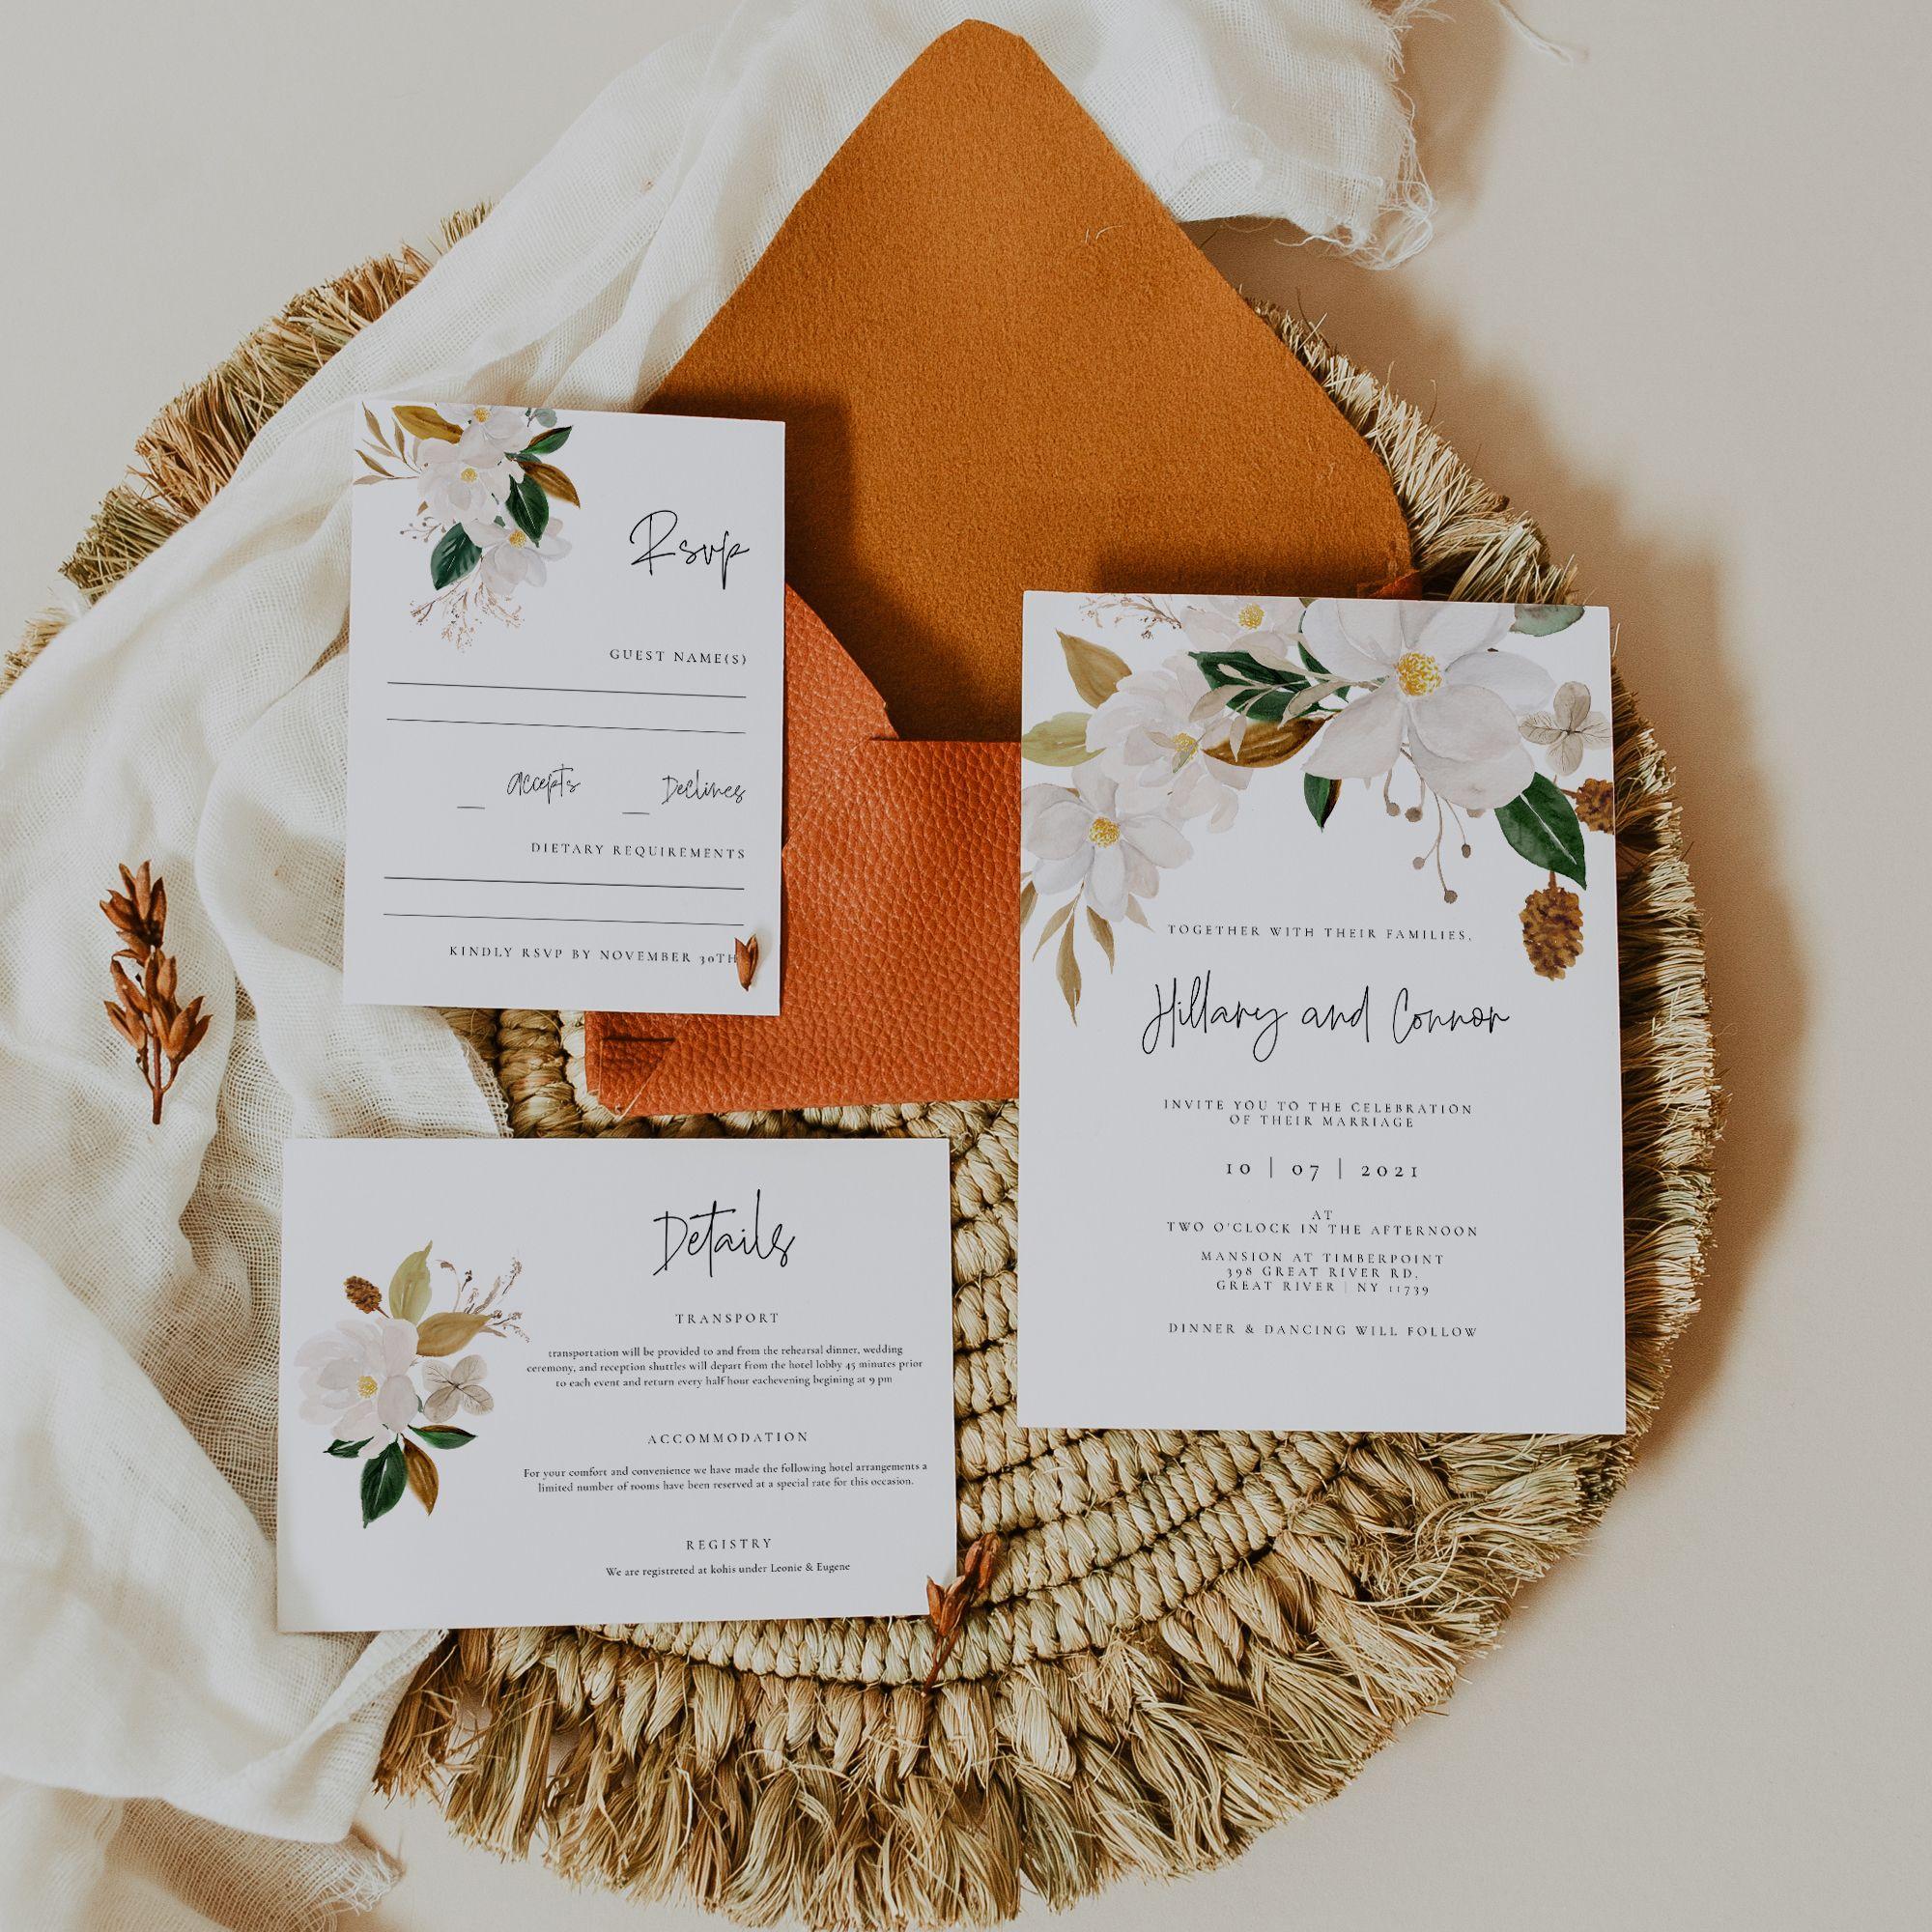 White Magnolia Wedding invitation set.jpg